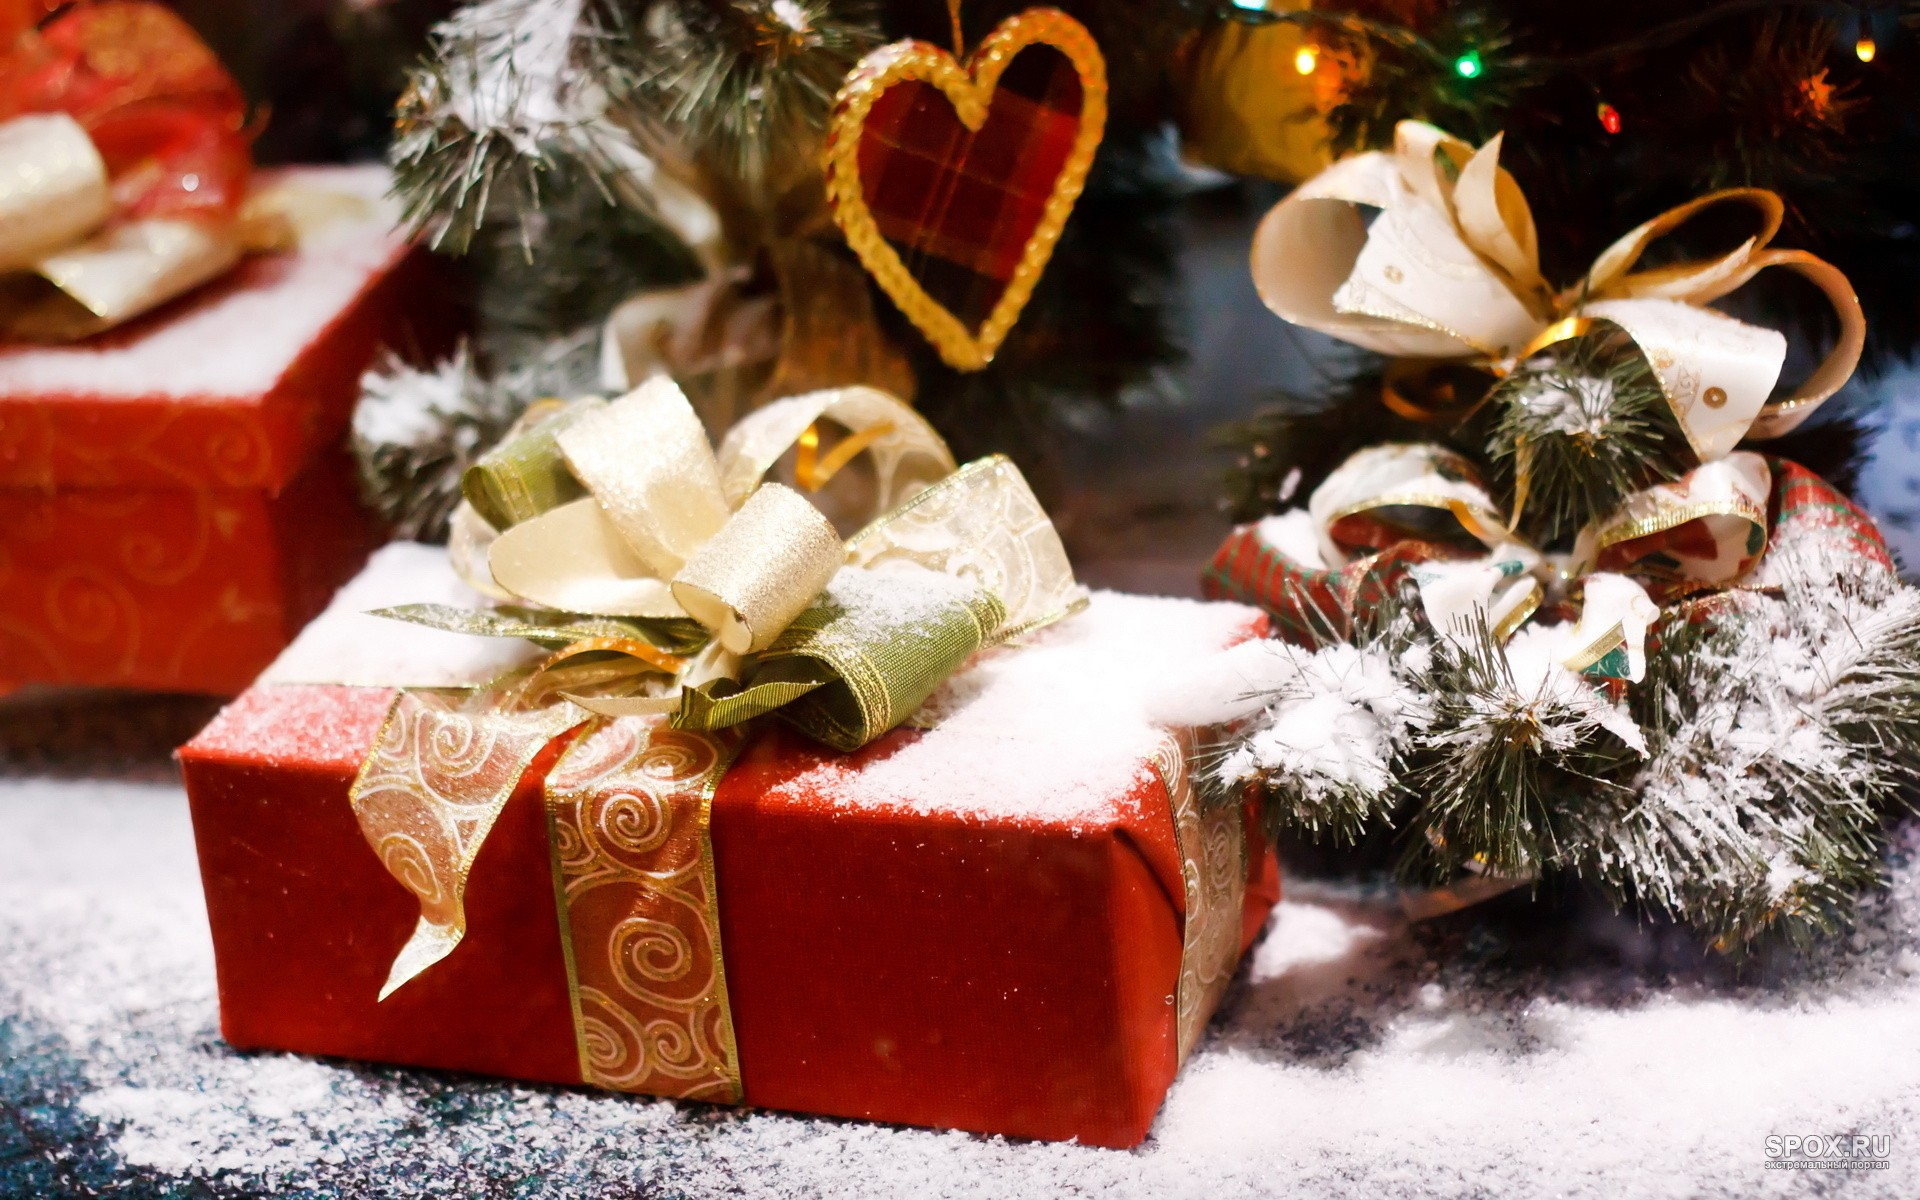 Photo of Подарки на Новый Год. Гид Подарки на Новый Год. Гид Подарки на Новый Год. Гид idei novogodnih podarkov 2015 1